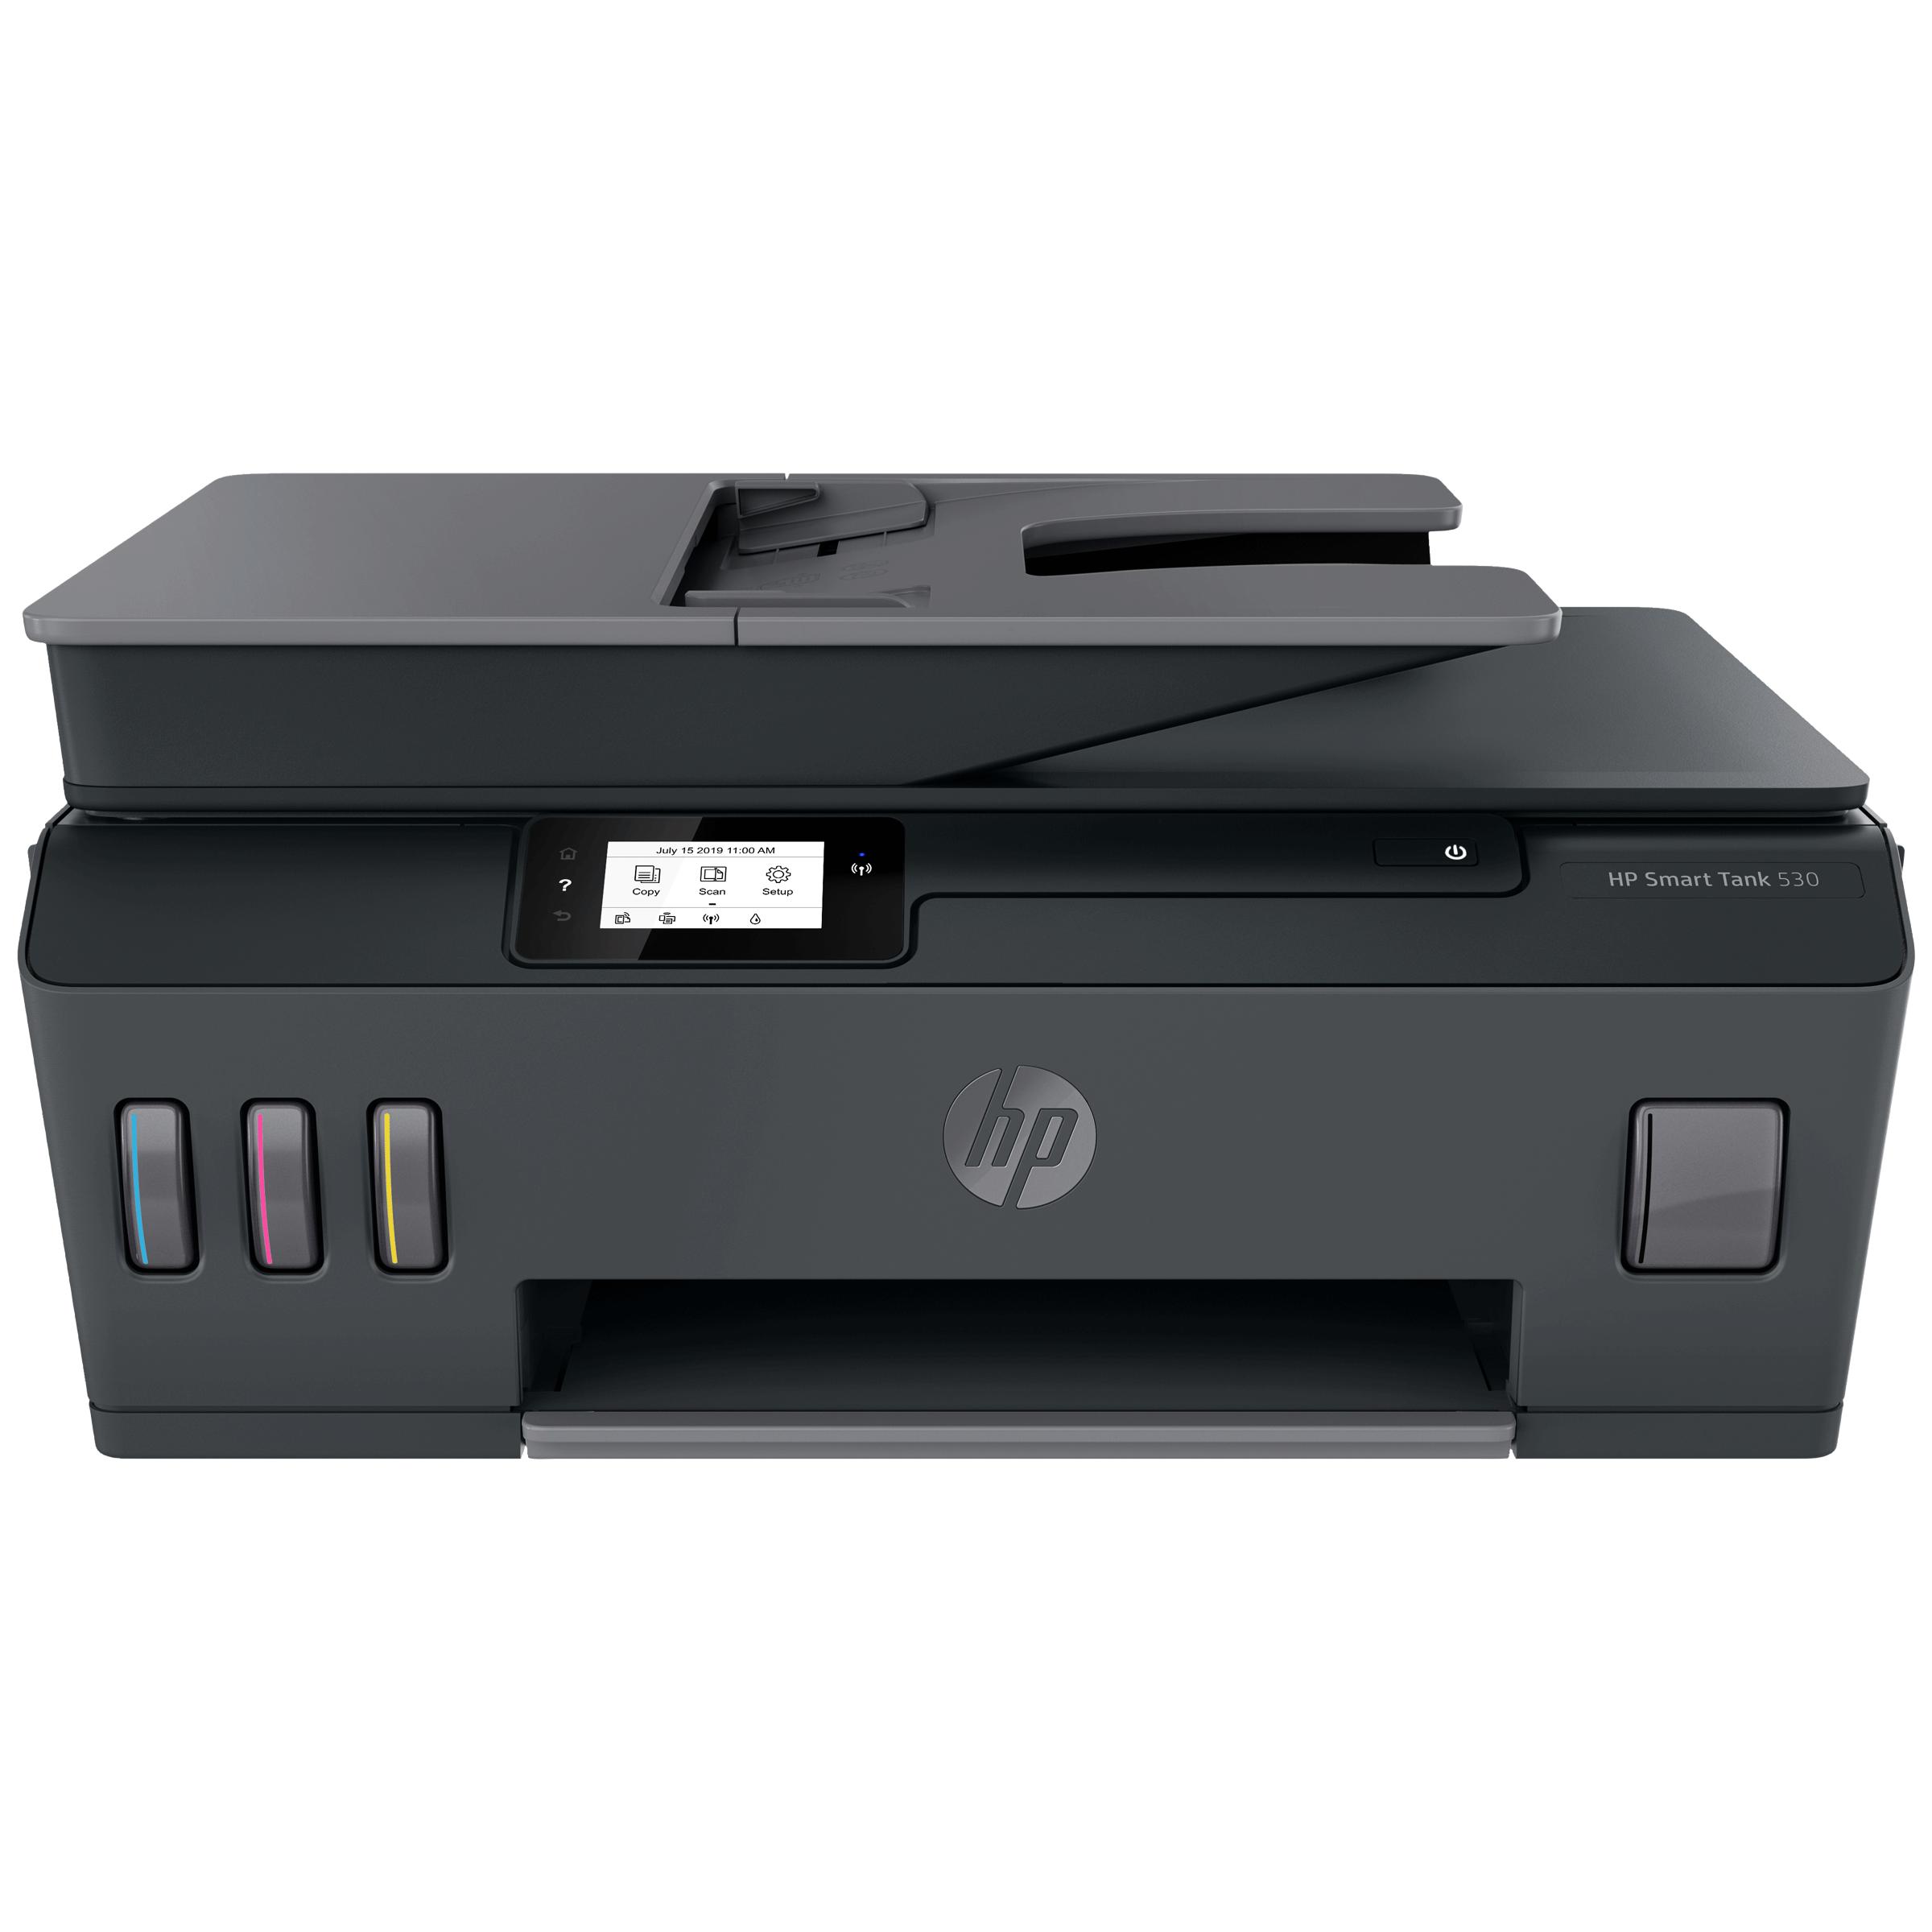 HP Smart Tank 530 Wireless Color All-in-One Inkjet Printer (Auto Document Feeder, 4SB24A#ACJ, Grey)_1